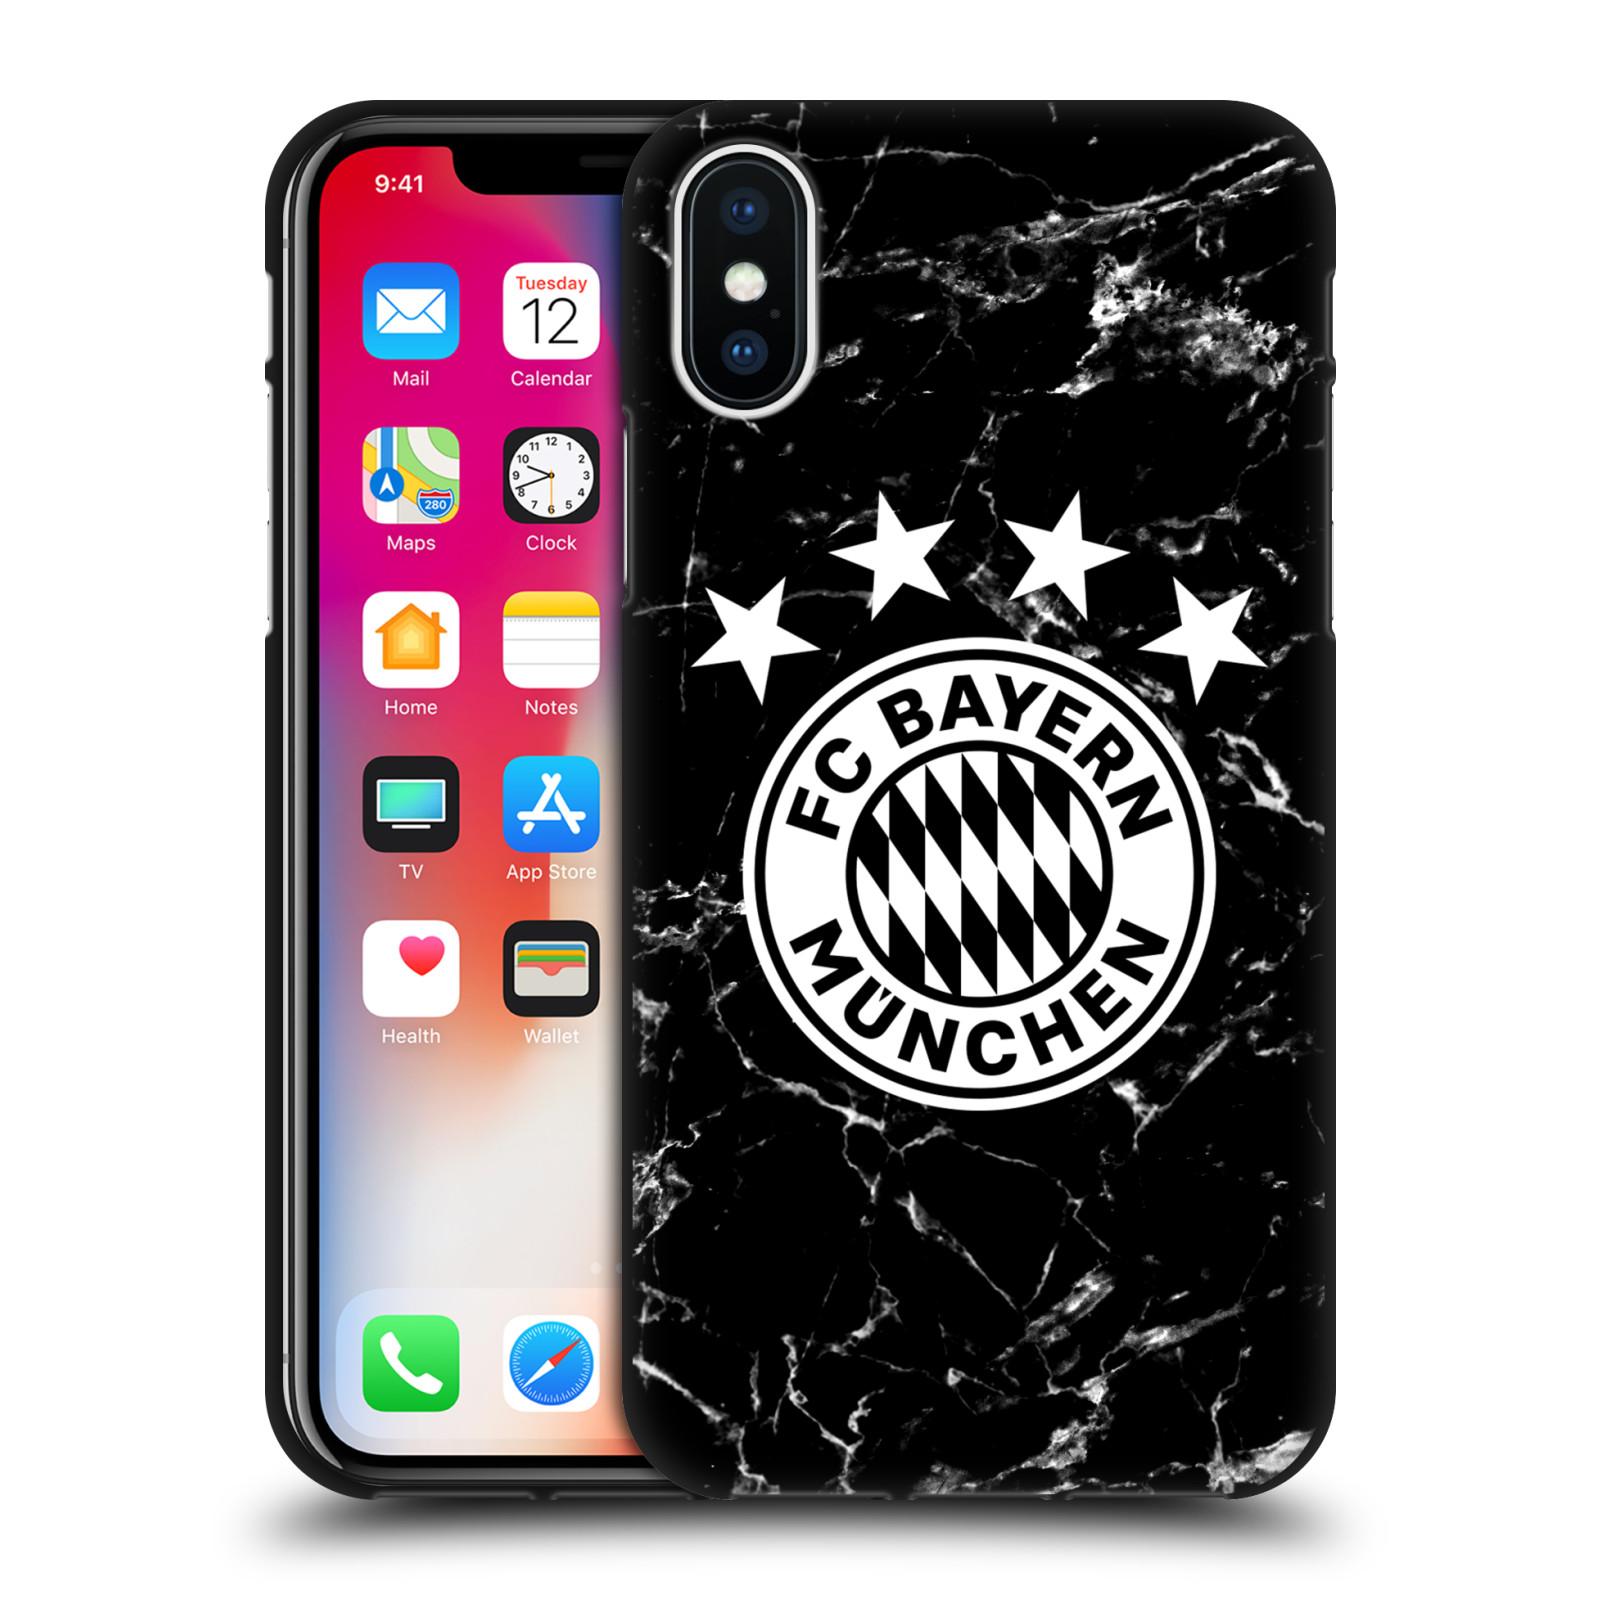 FC-BAYERN-MUNICH-2017-18-PATTERNS-BLACK-SOFT-GEL-CASE-FOR-APPLE-iPHONE-PHONES